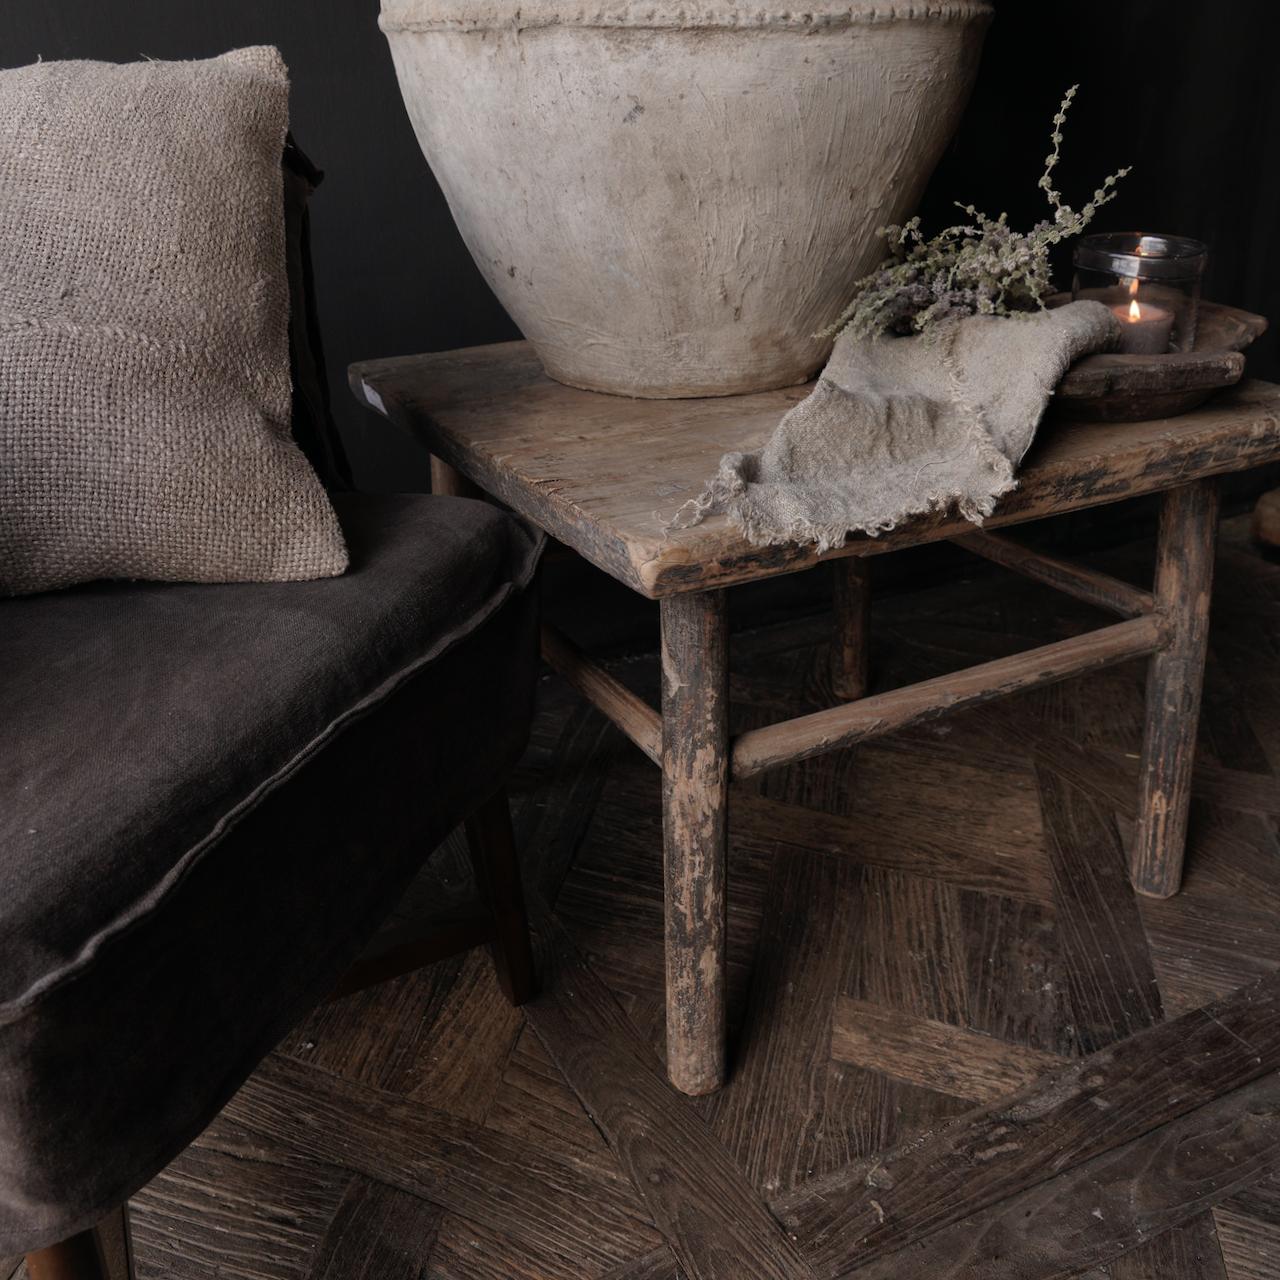 Oud Authentiek houten Salon/bijzet Tafeltje vierkant Uniek item-8